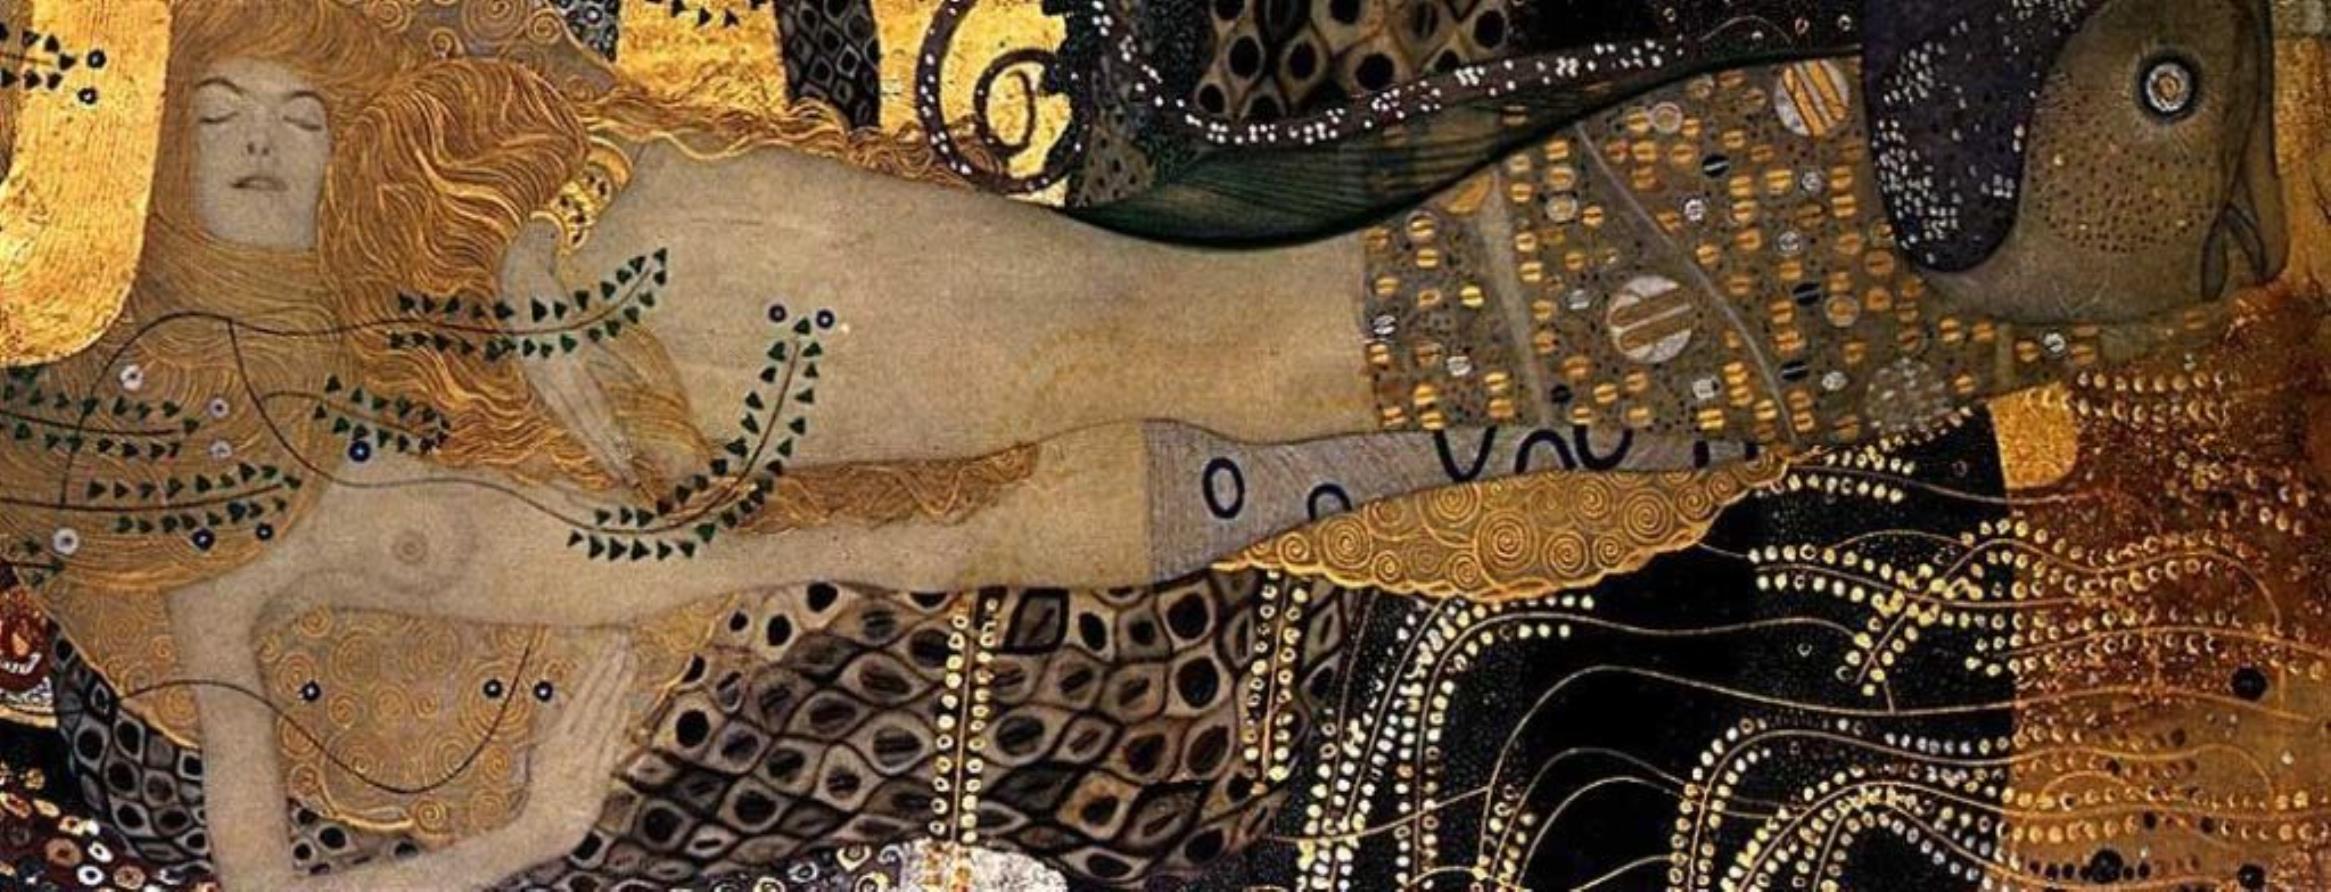 Gustav Klimt. Les serpents de l'eau 1904-1907